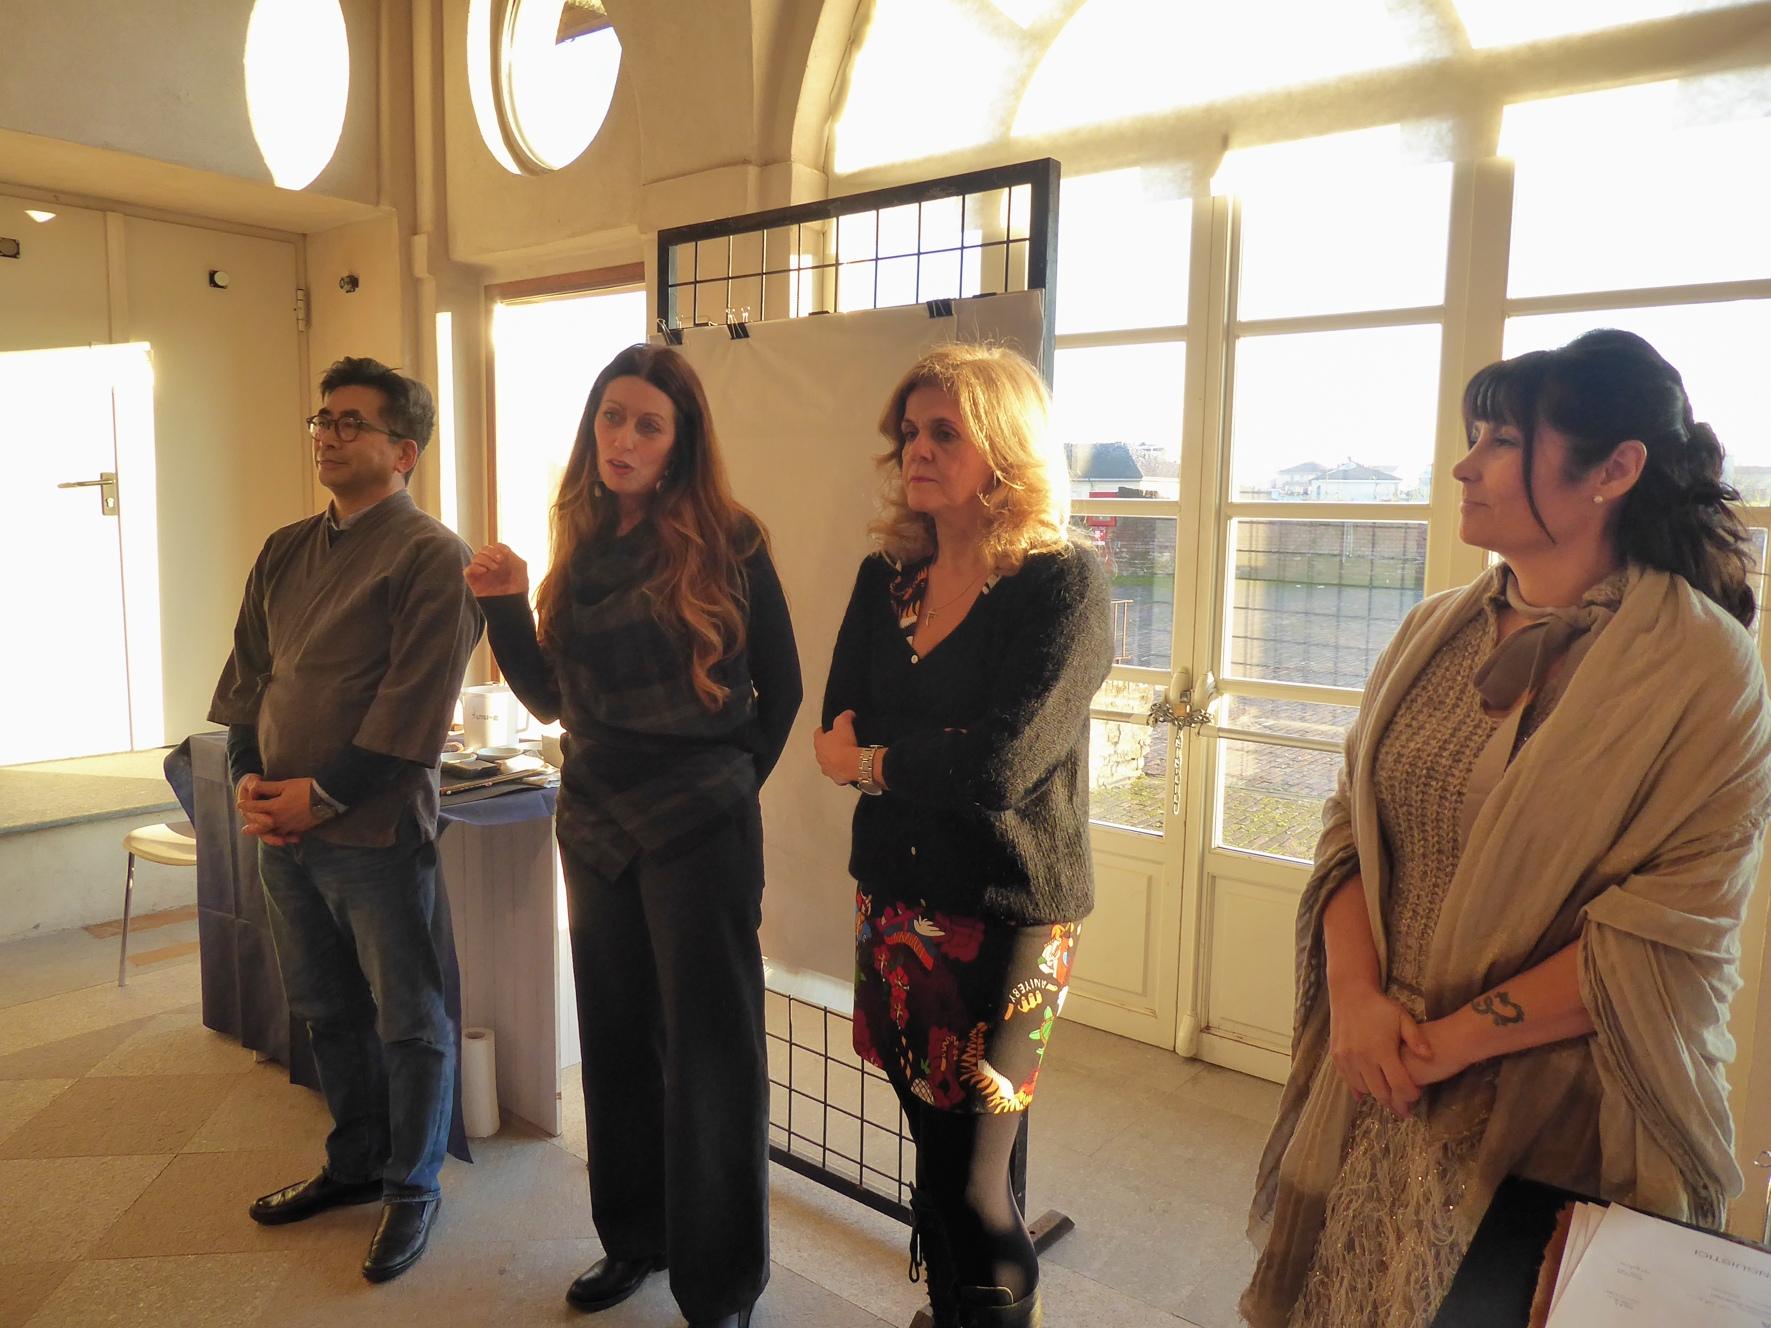 Nella foto da sinistra: Shoze Koike, Iris Devasini, Assessore Gigliola Fracchia e Paola Casulli